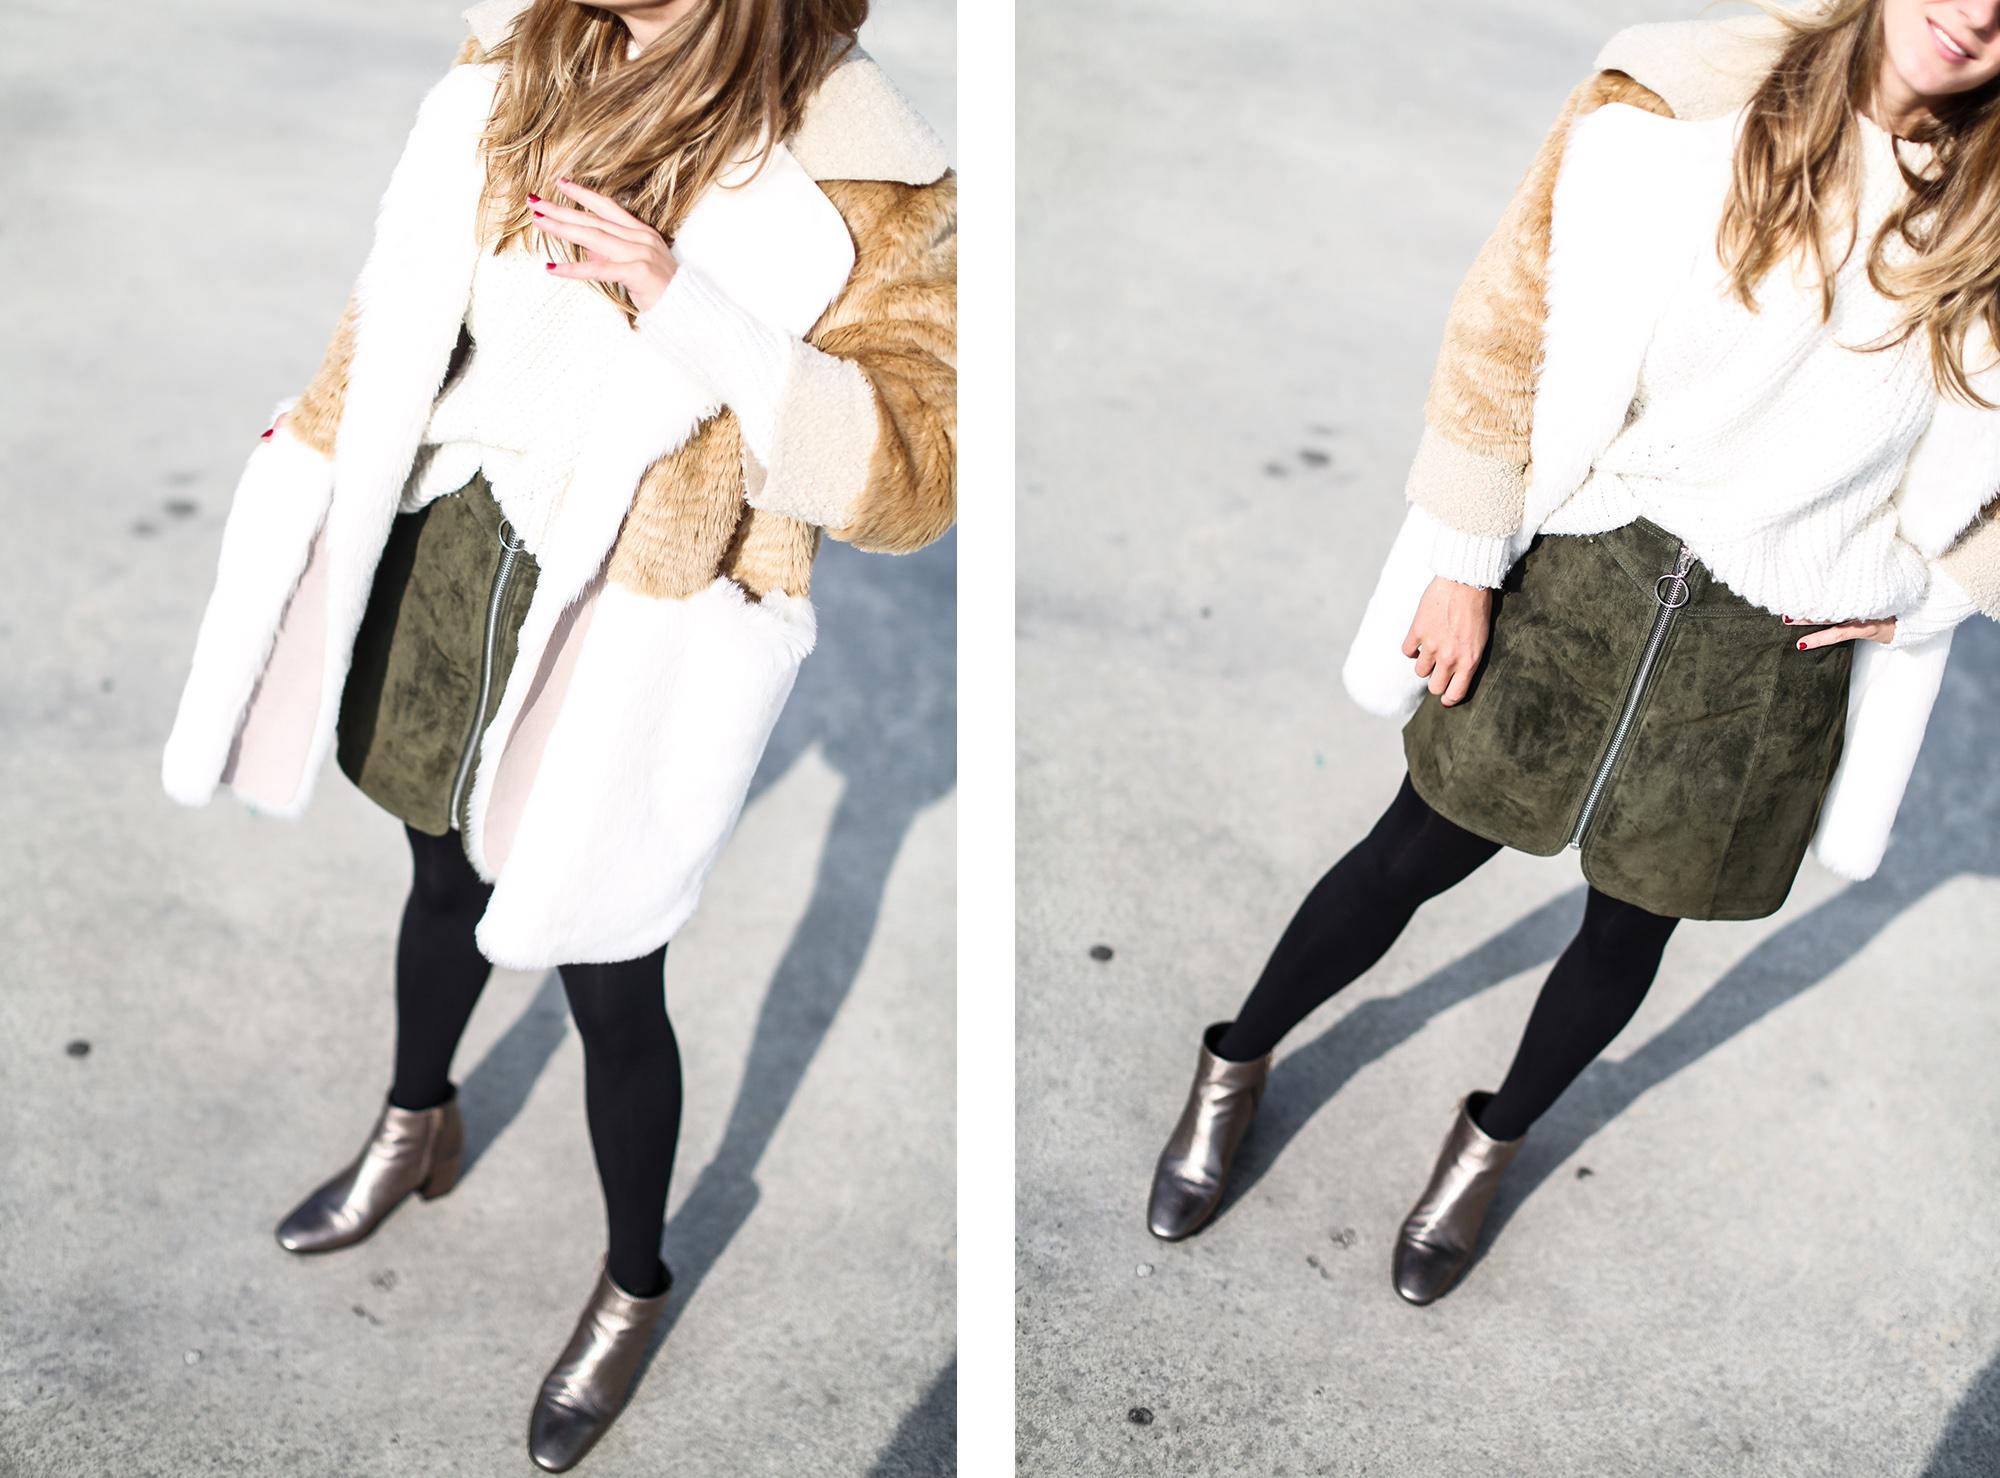 Clochet_streetstyle_fashionblogger_asosfauxfurcoat_minifaldaantezara_botinespieldorados-11